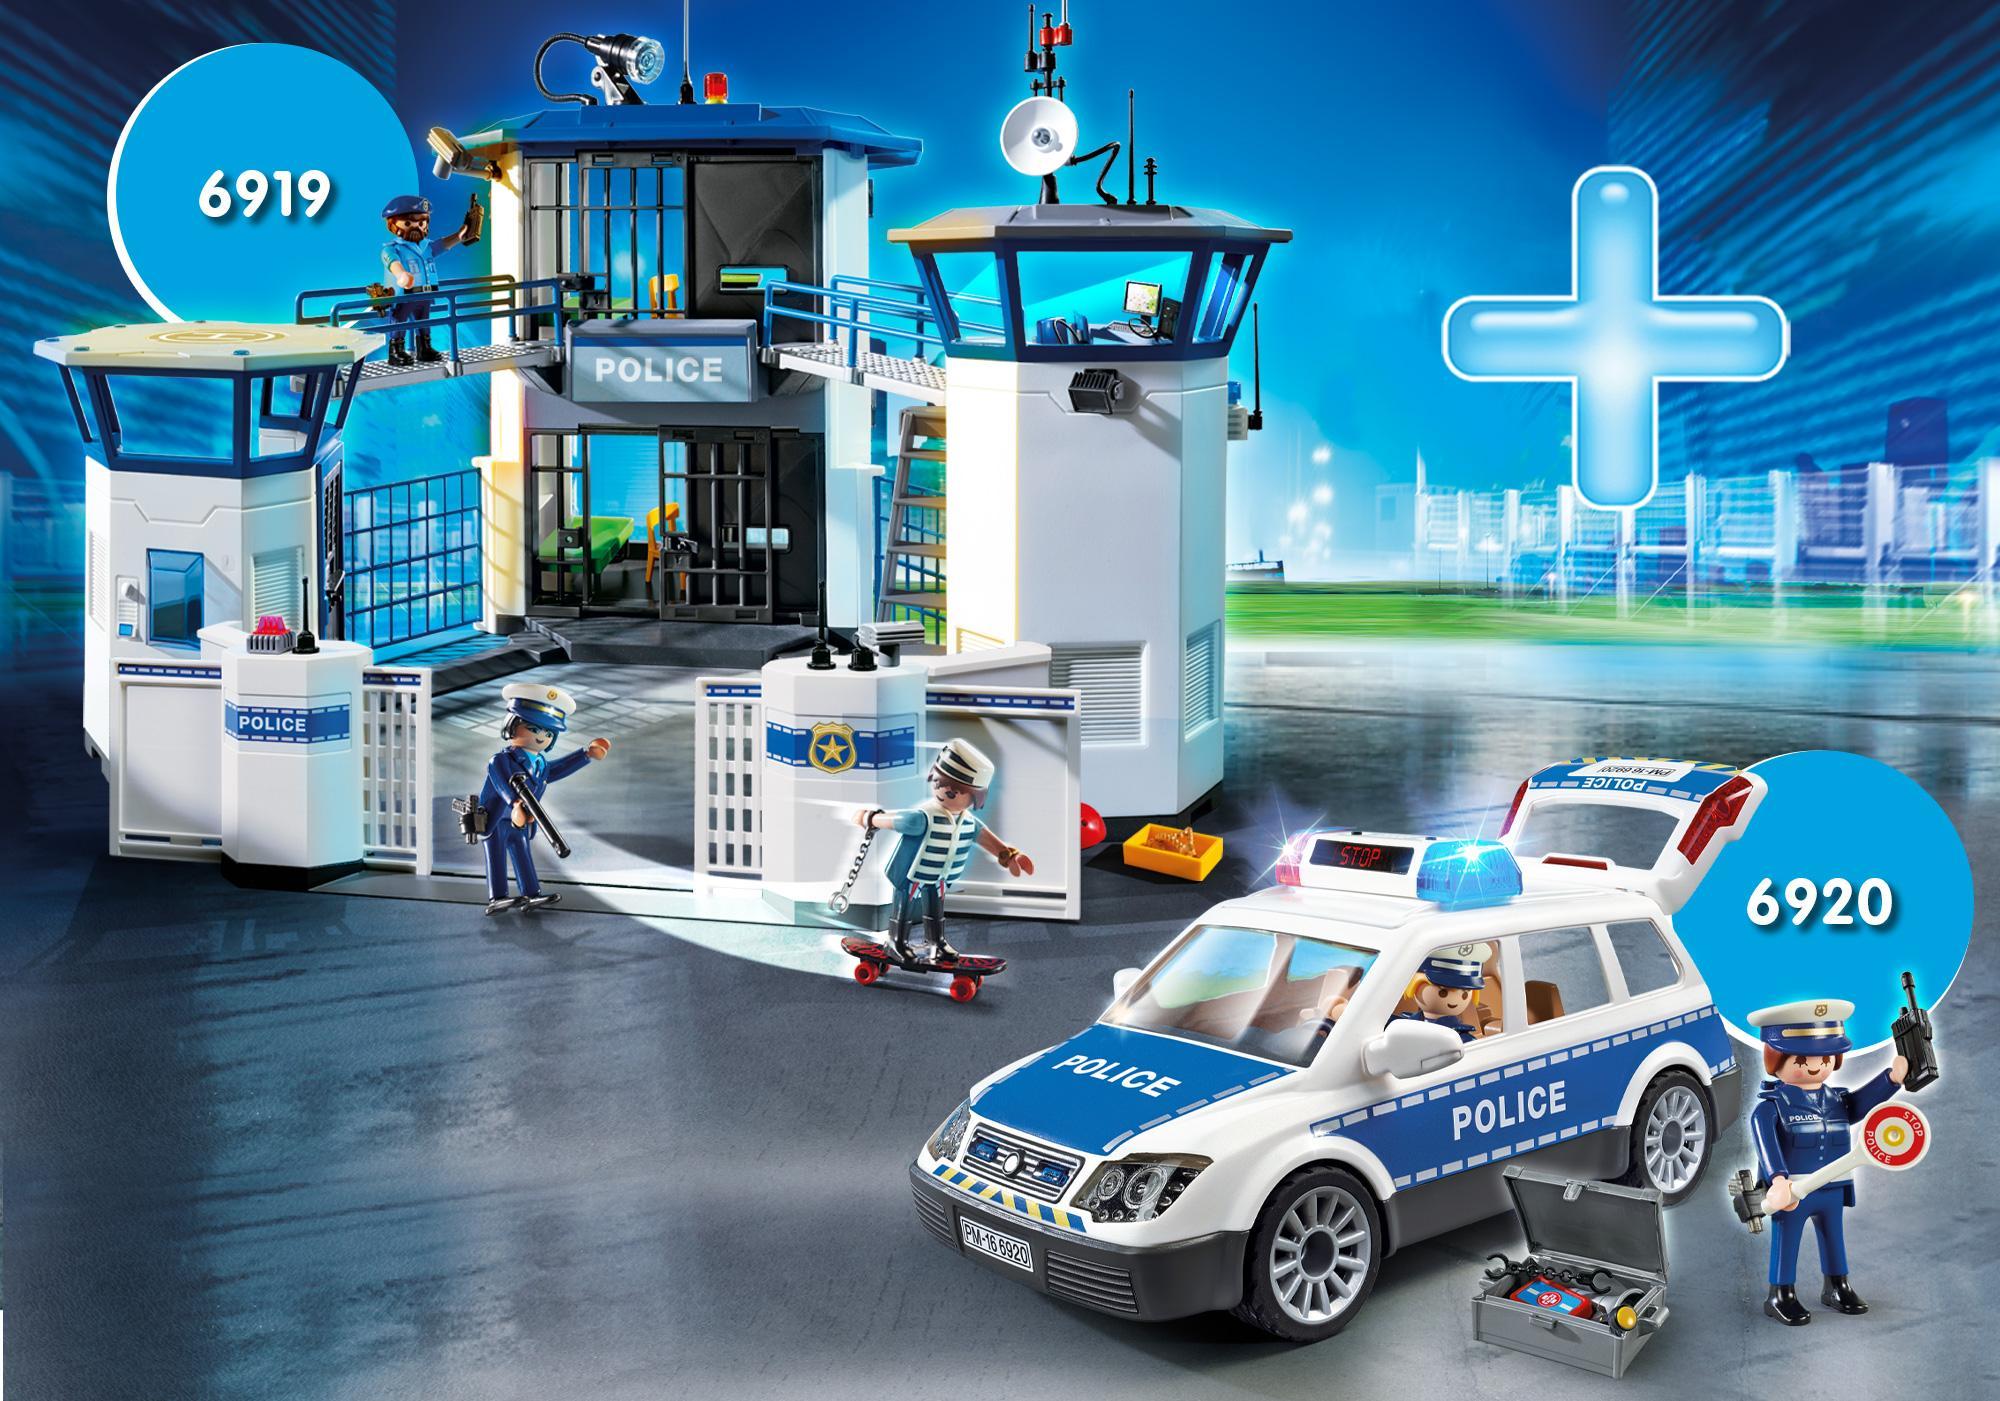 http://media.playmobil.com/i/playmobil/PM1905B_product_detail/Pack Promocional Policía